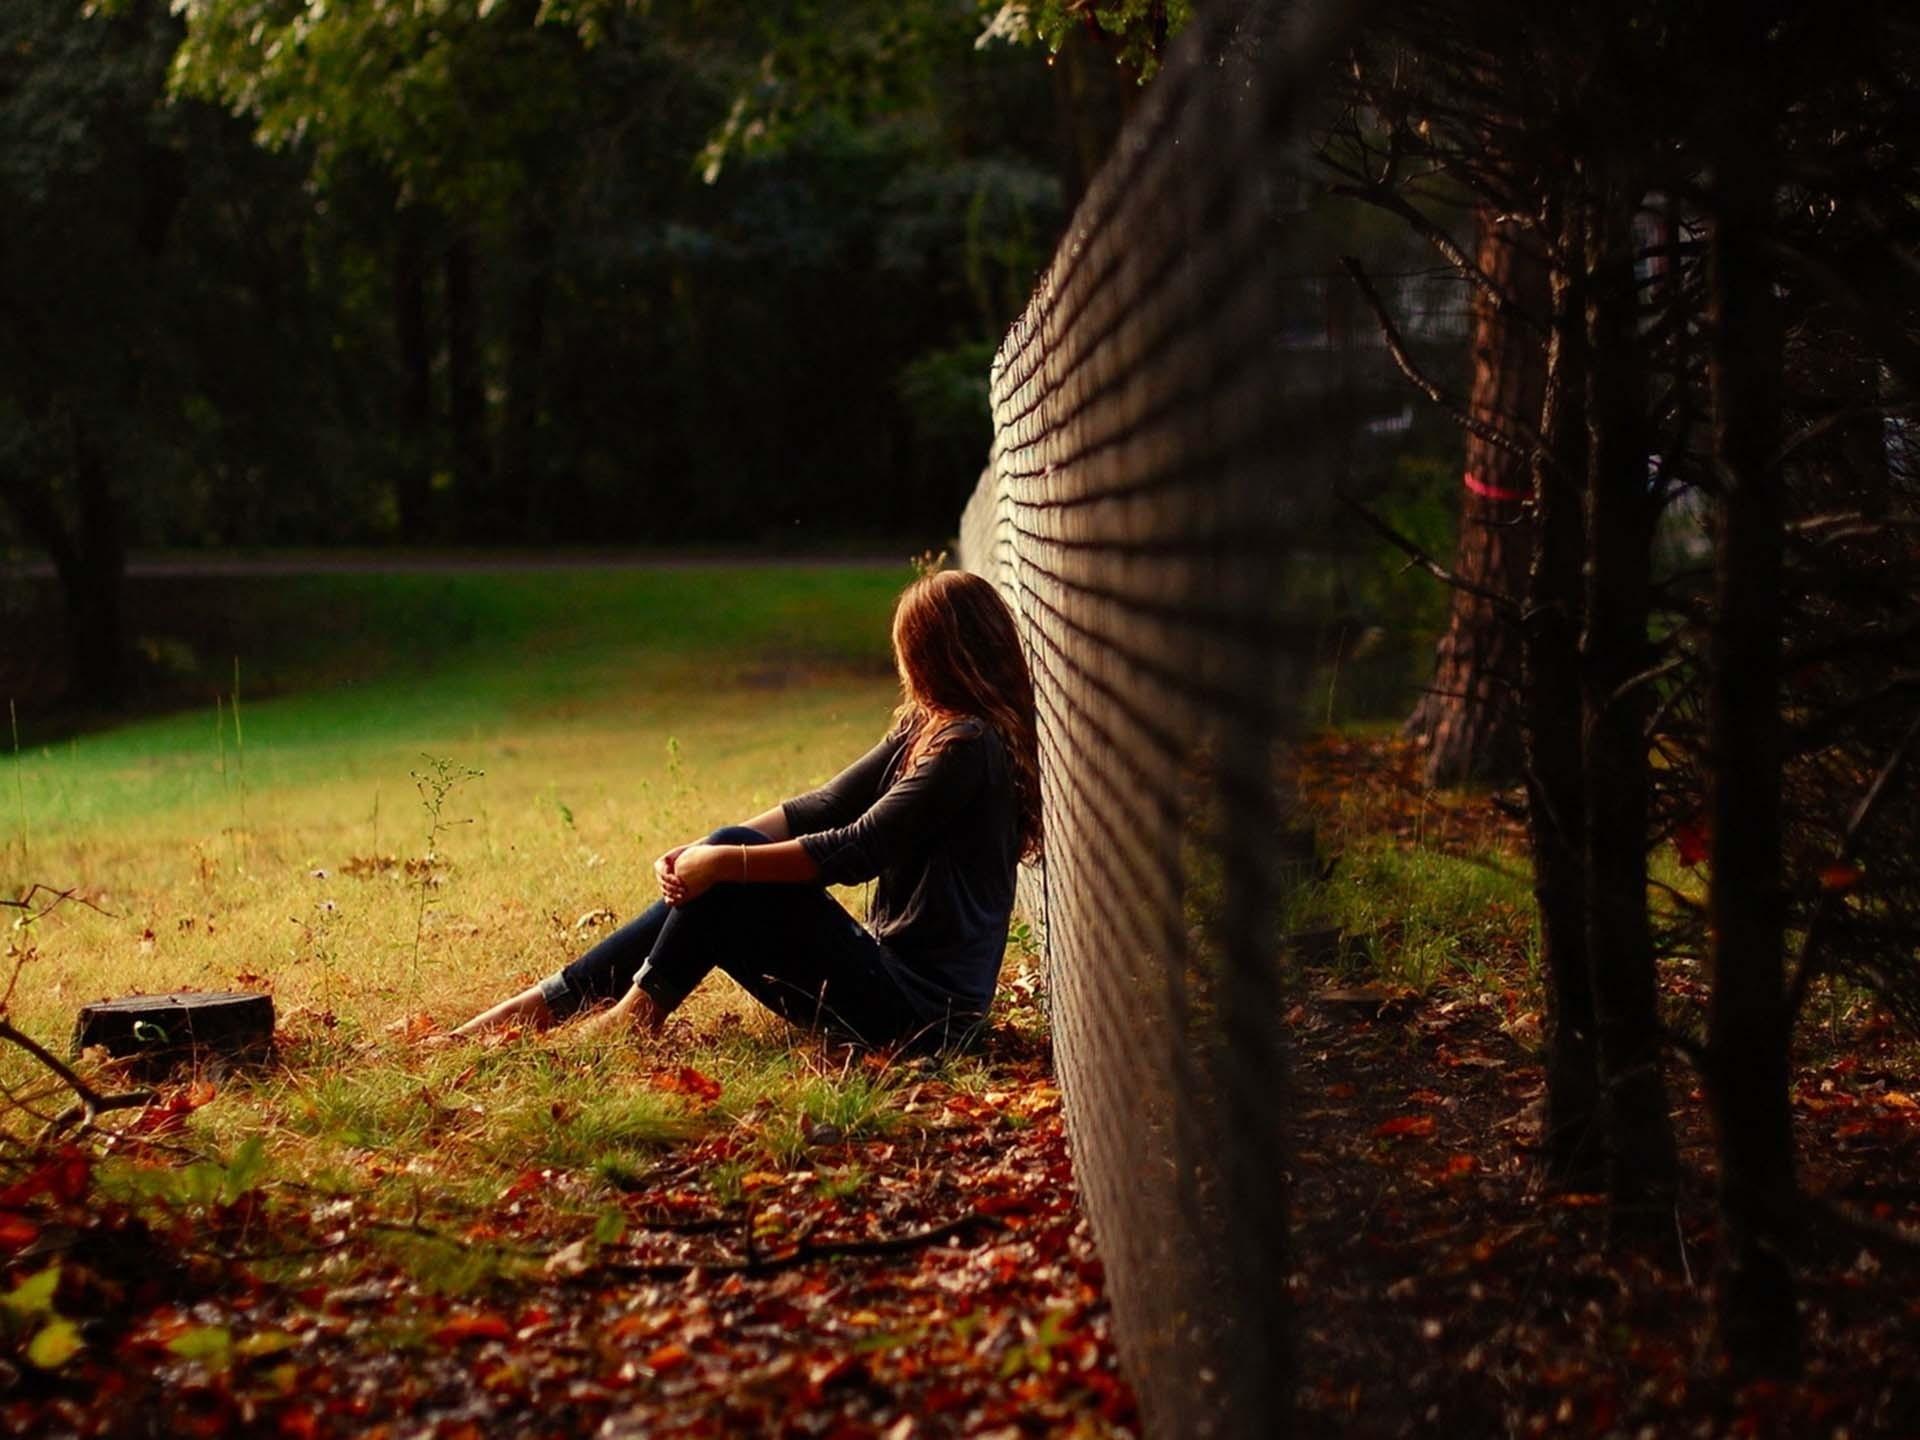 Sad Breakup Image For Girls Sad Girl Wallpapers, 43 - Sad Lonely Images Girl - HD Wallpaper